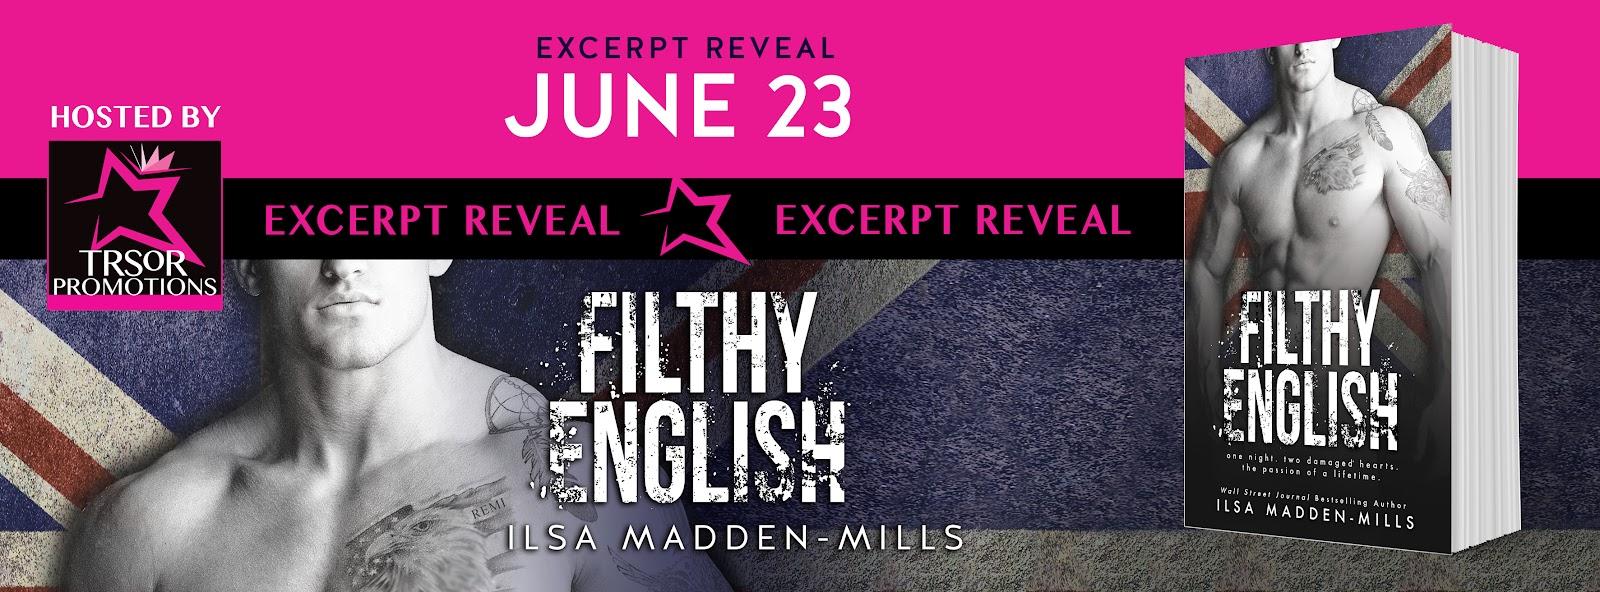 FILTHY_ENGLISH_EXCERPT.jpg